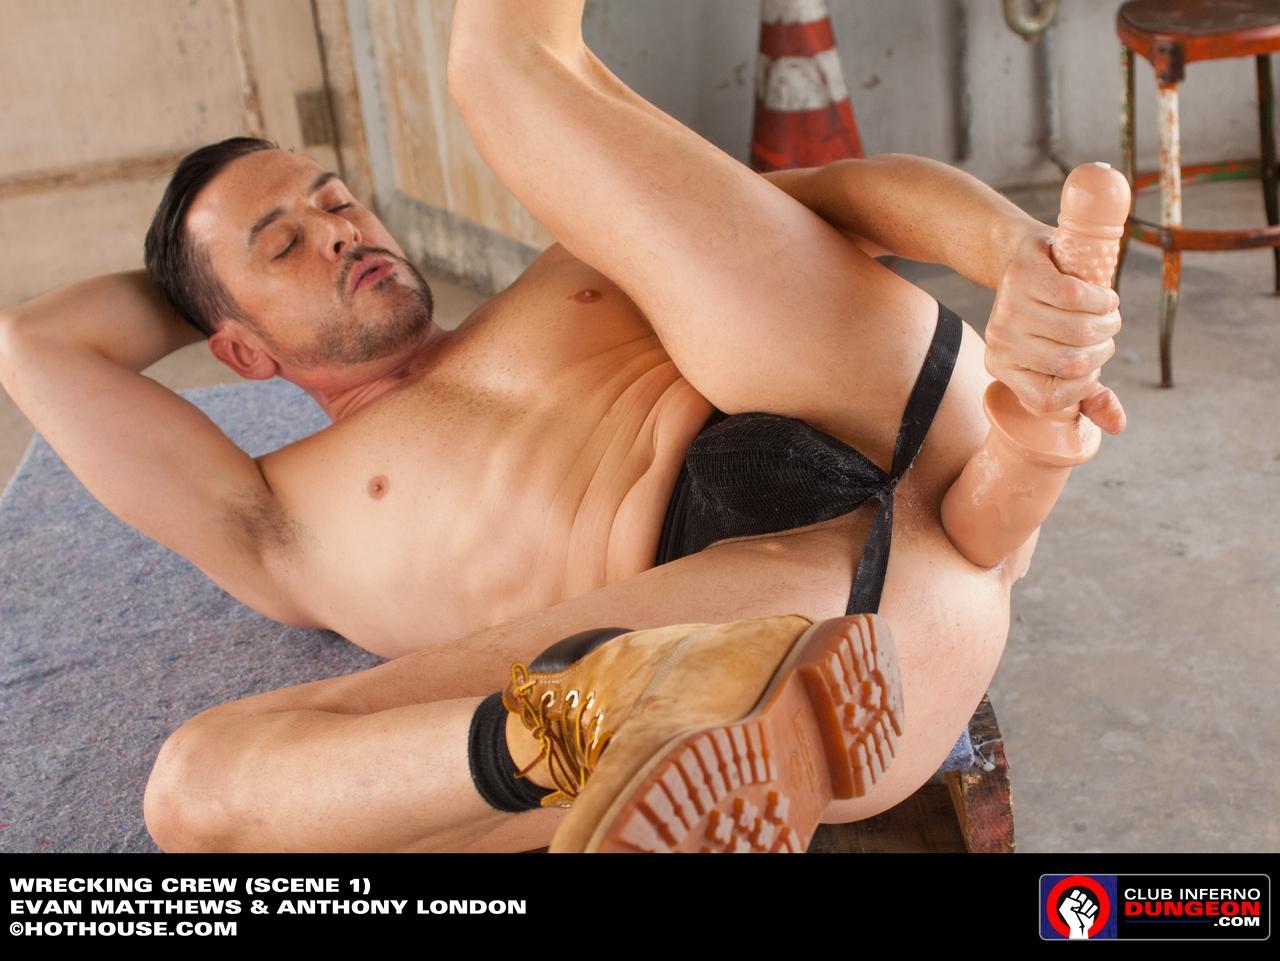 Hot petite brazilian porn pics